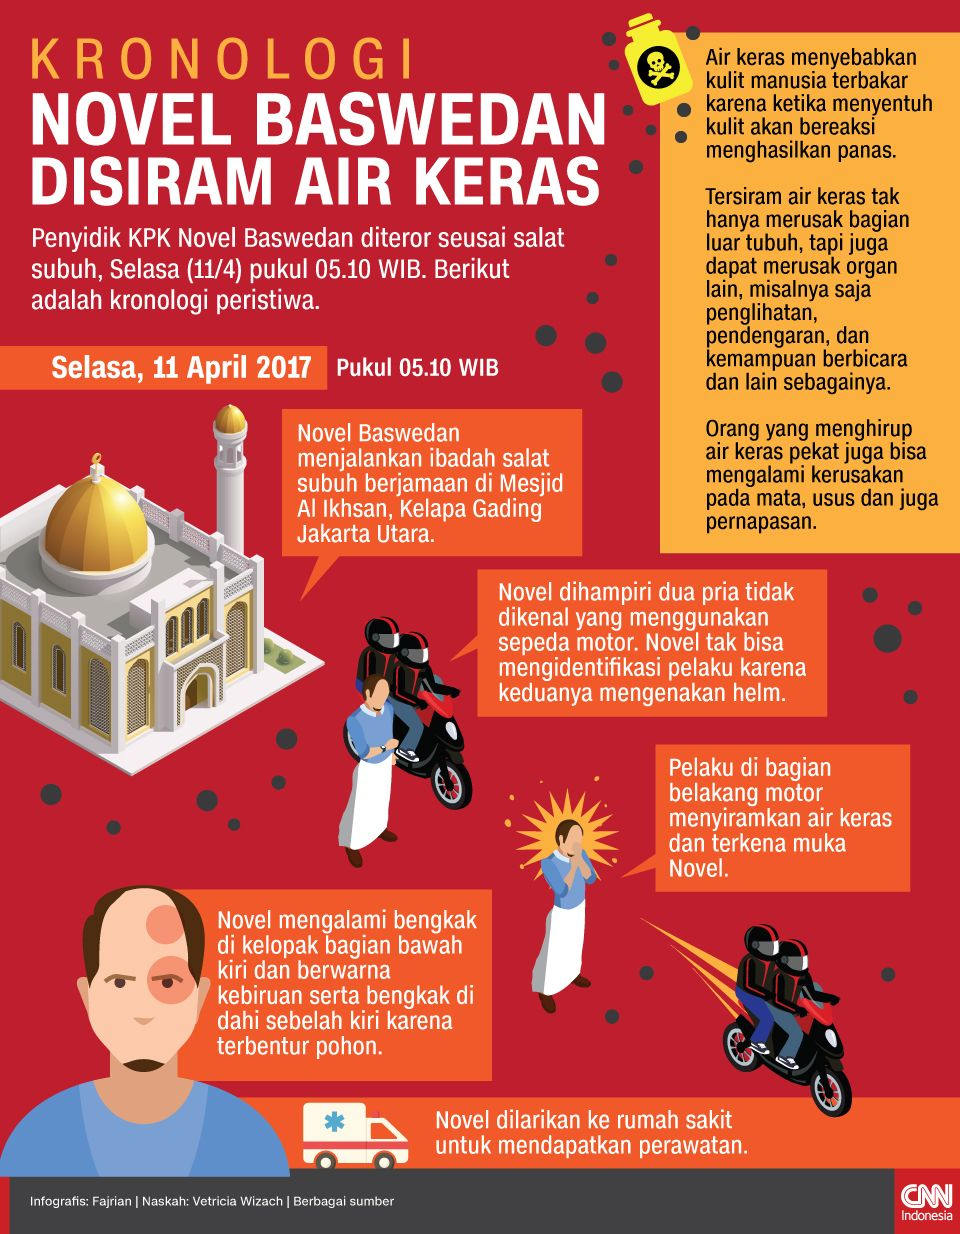 Infografis Kronologi Novel Baswedan disiram air Keras